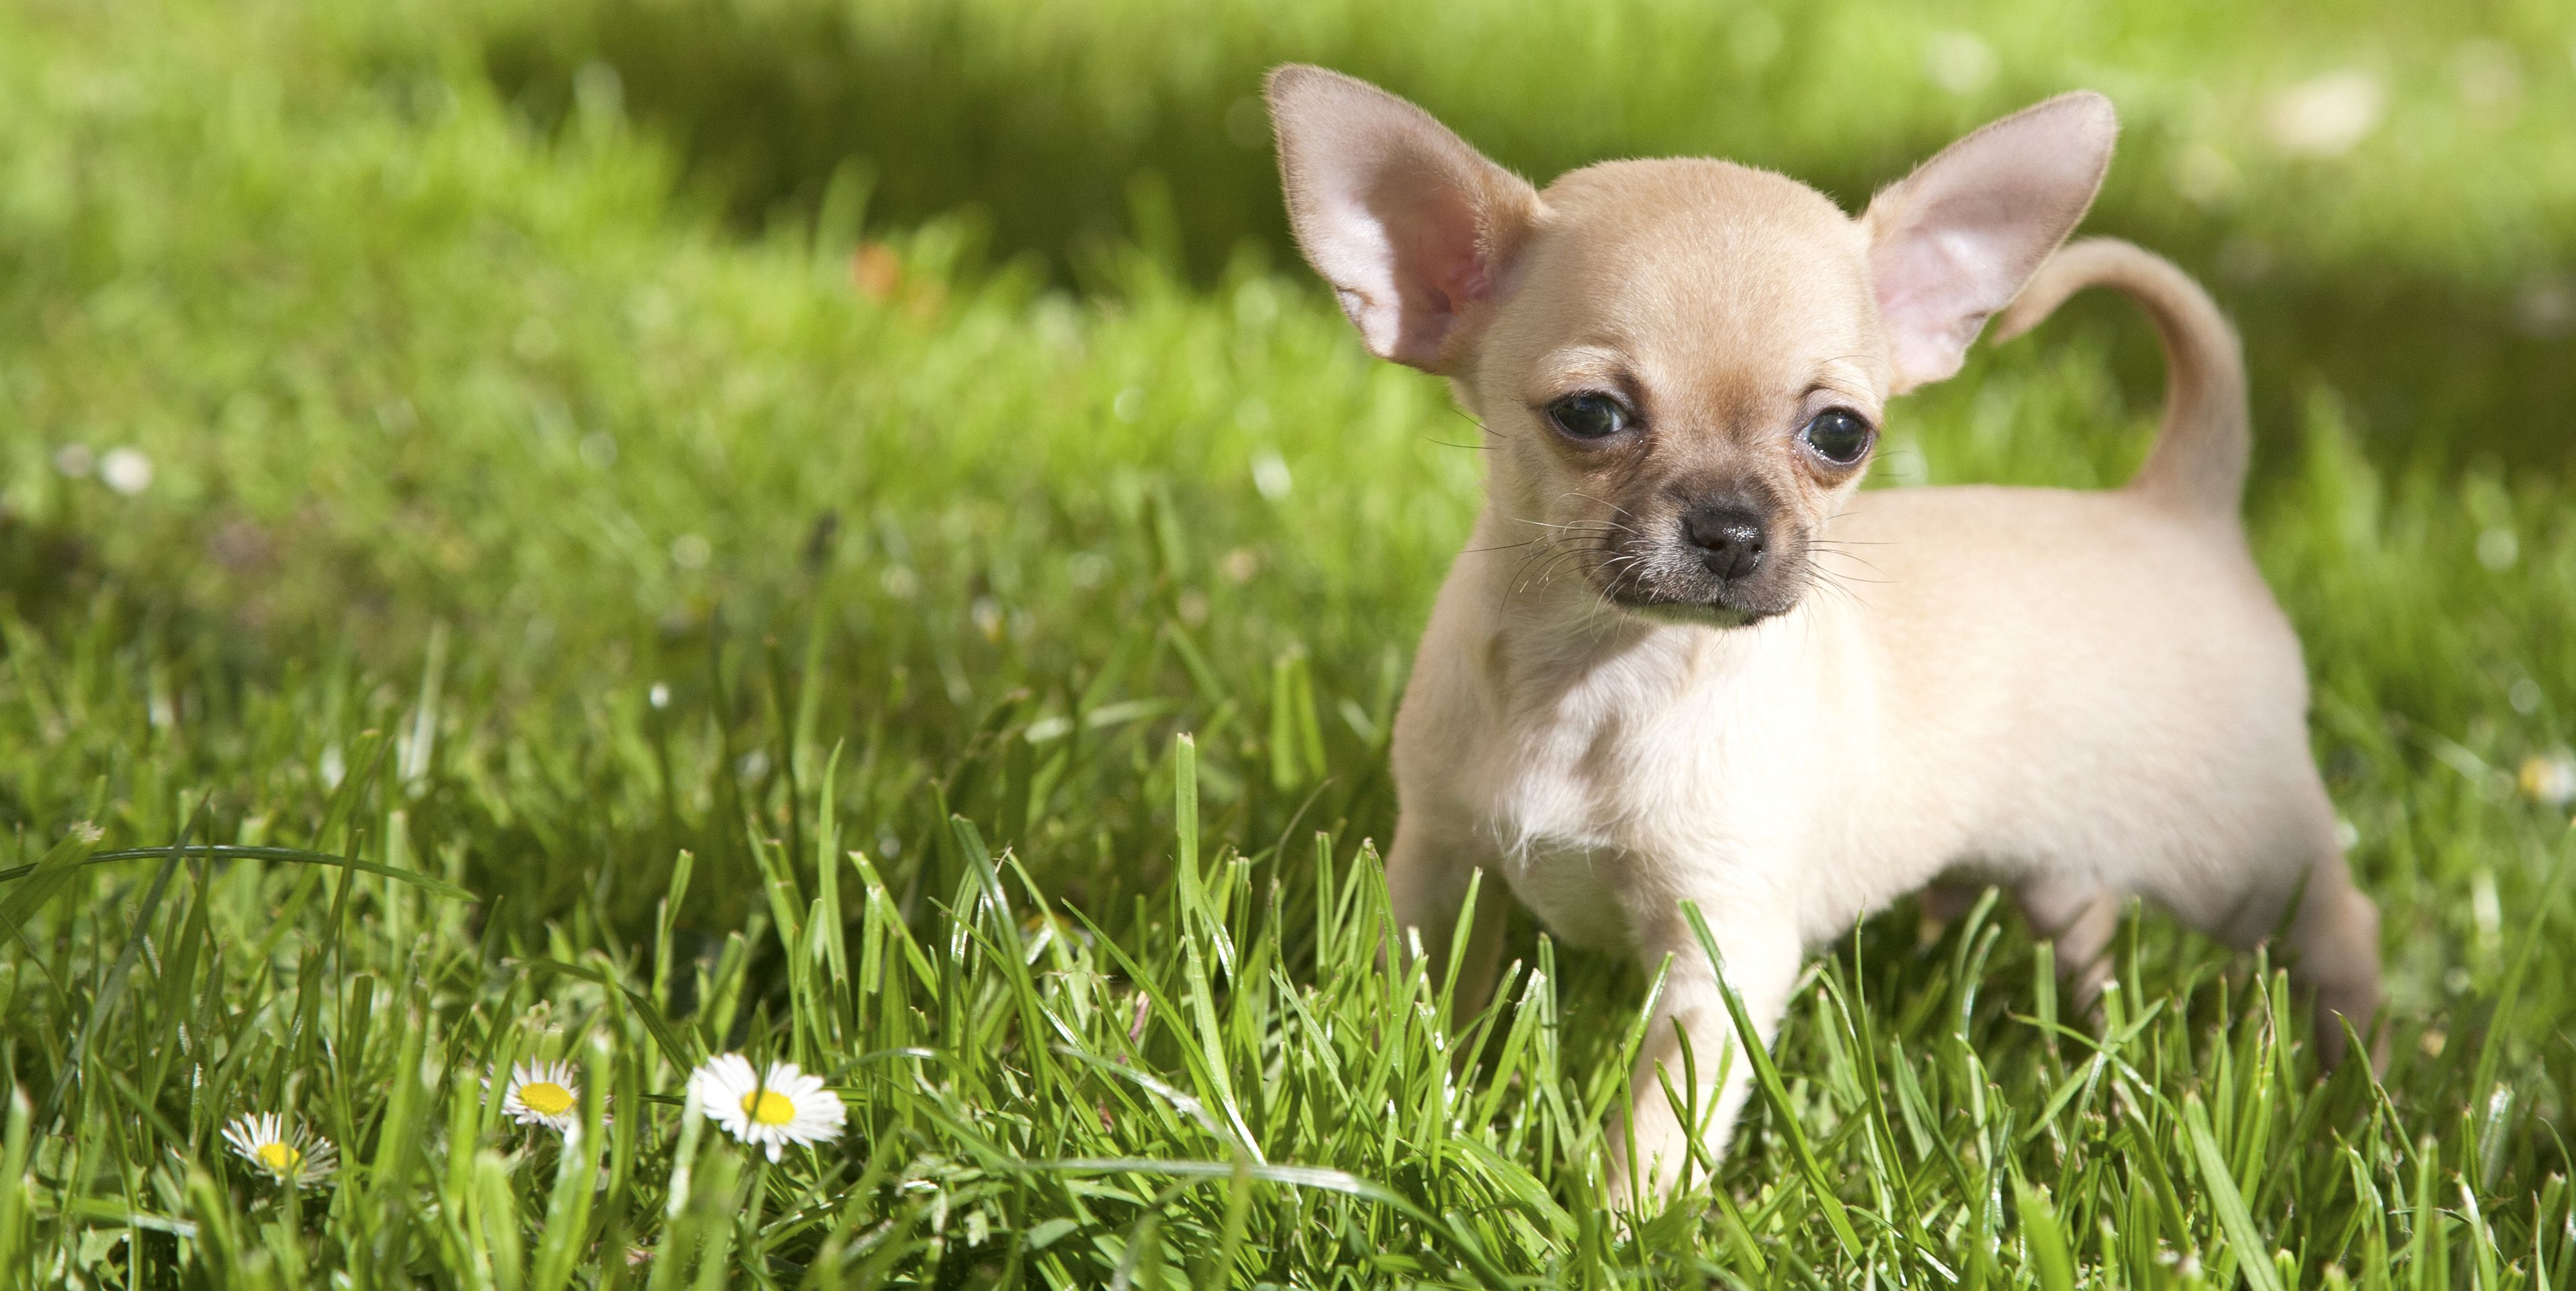 15 Cute Miniature Dog Breeds - Best Toy Dog Breed List